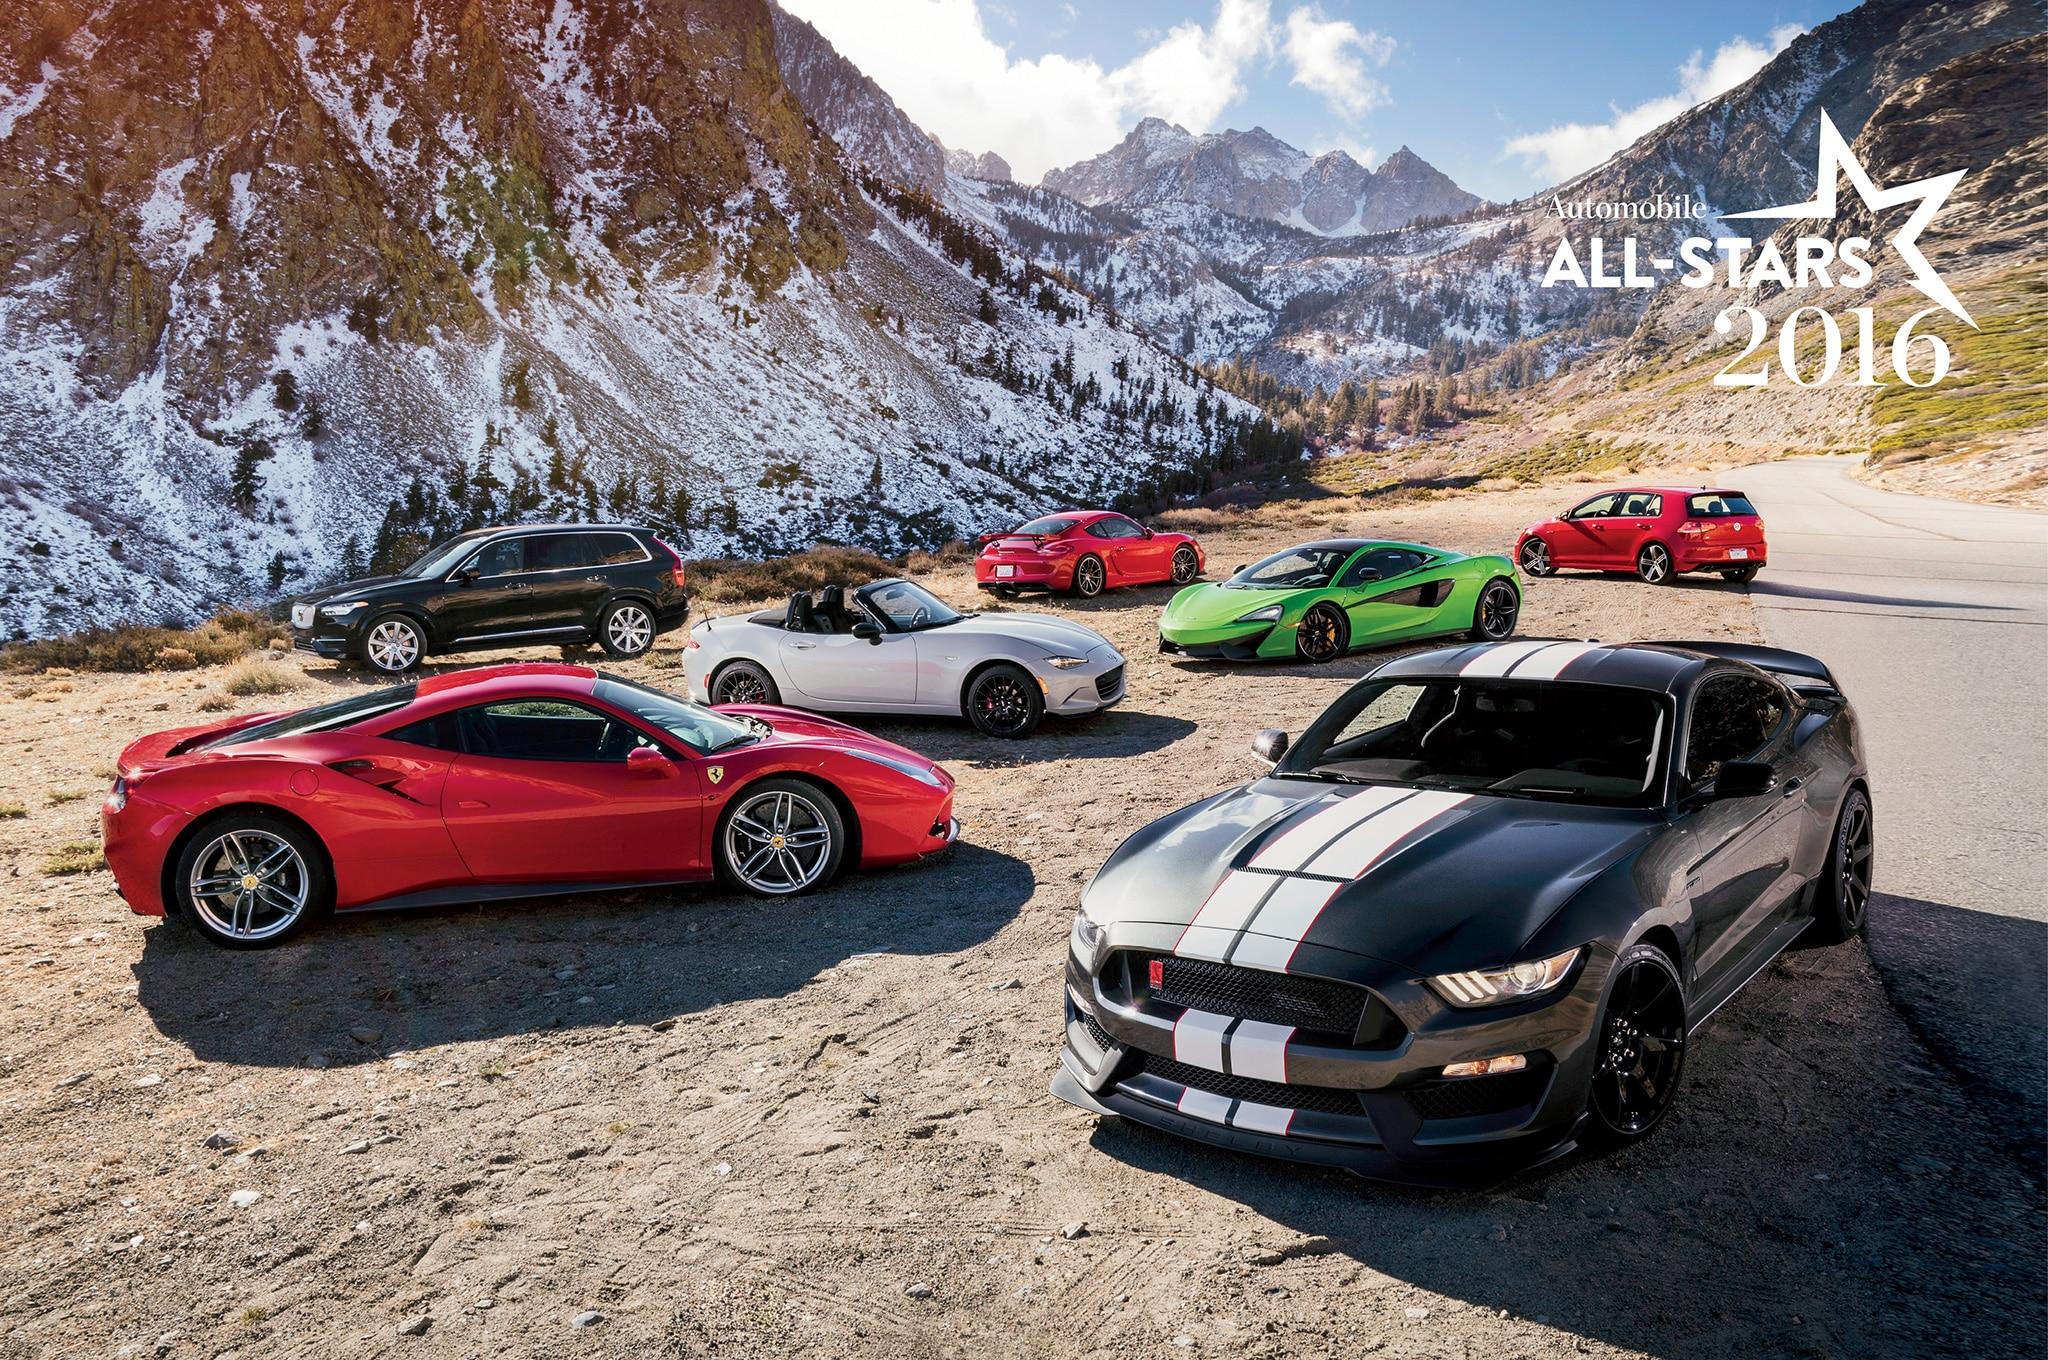 2016 Automobile All Stars Winners Story LEAD